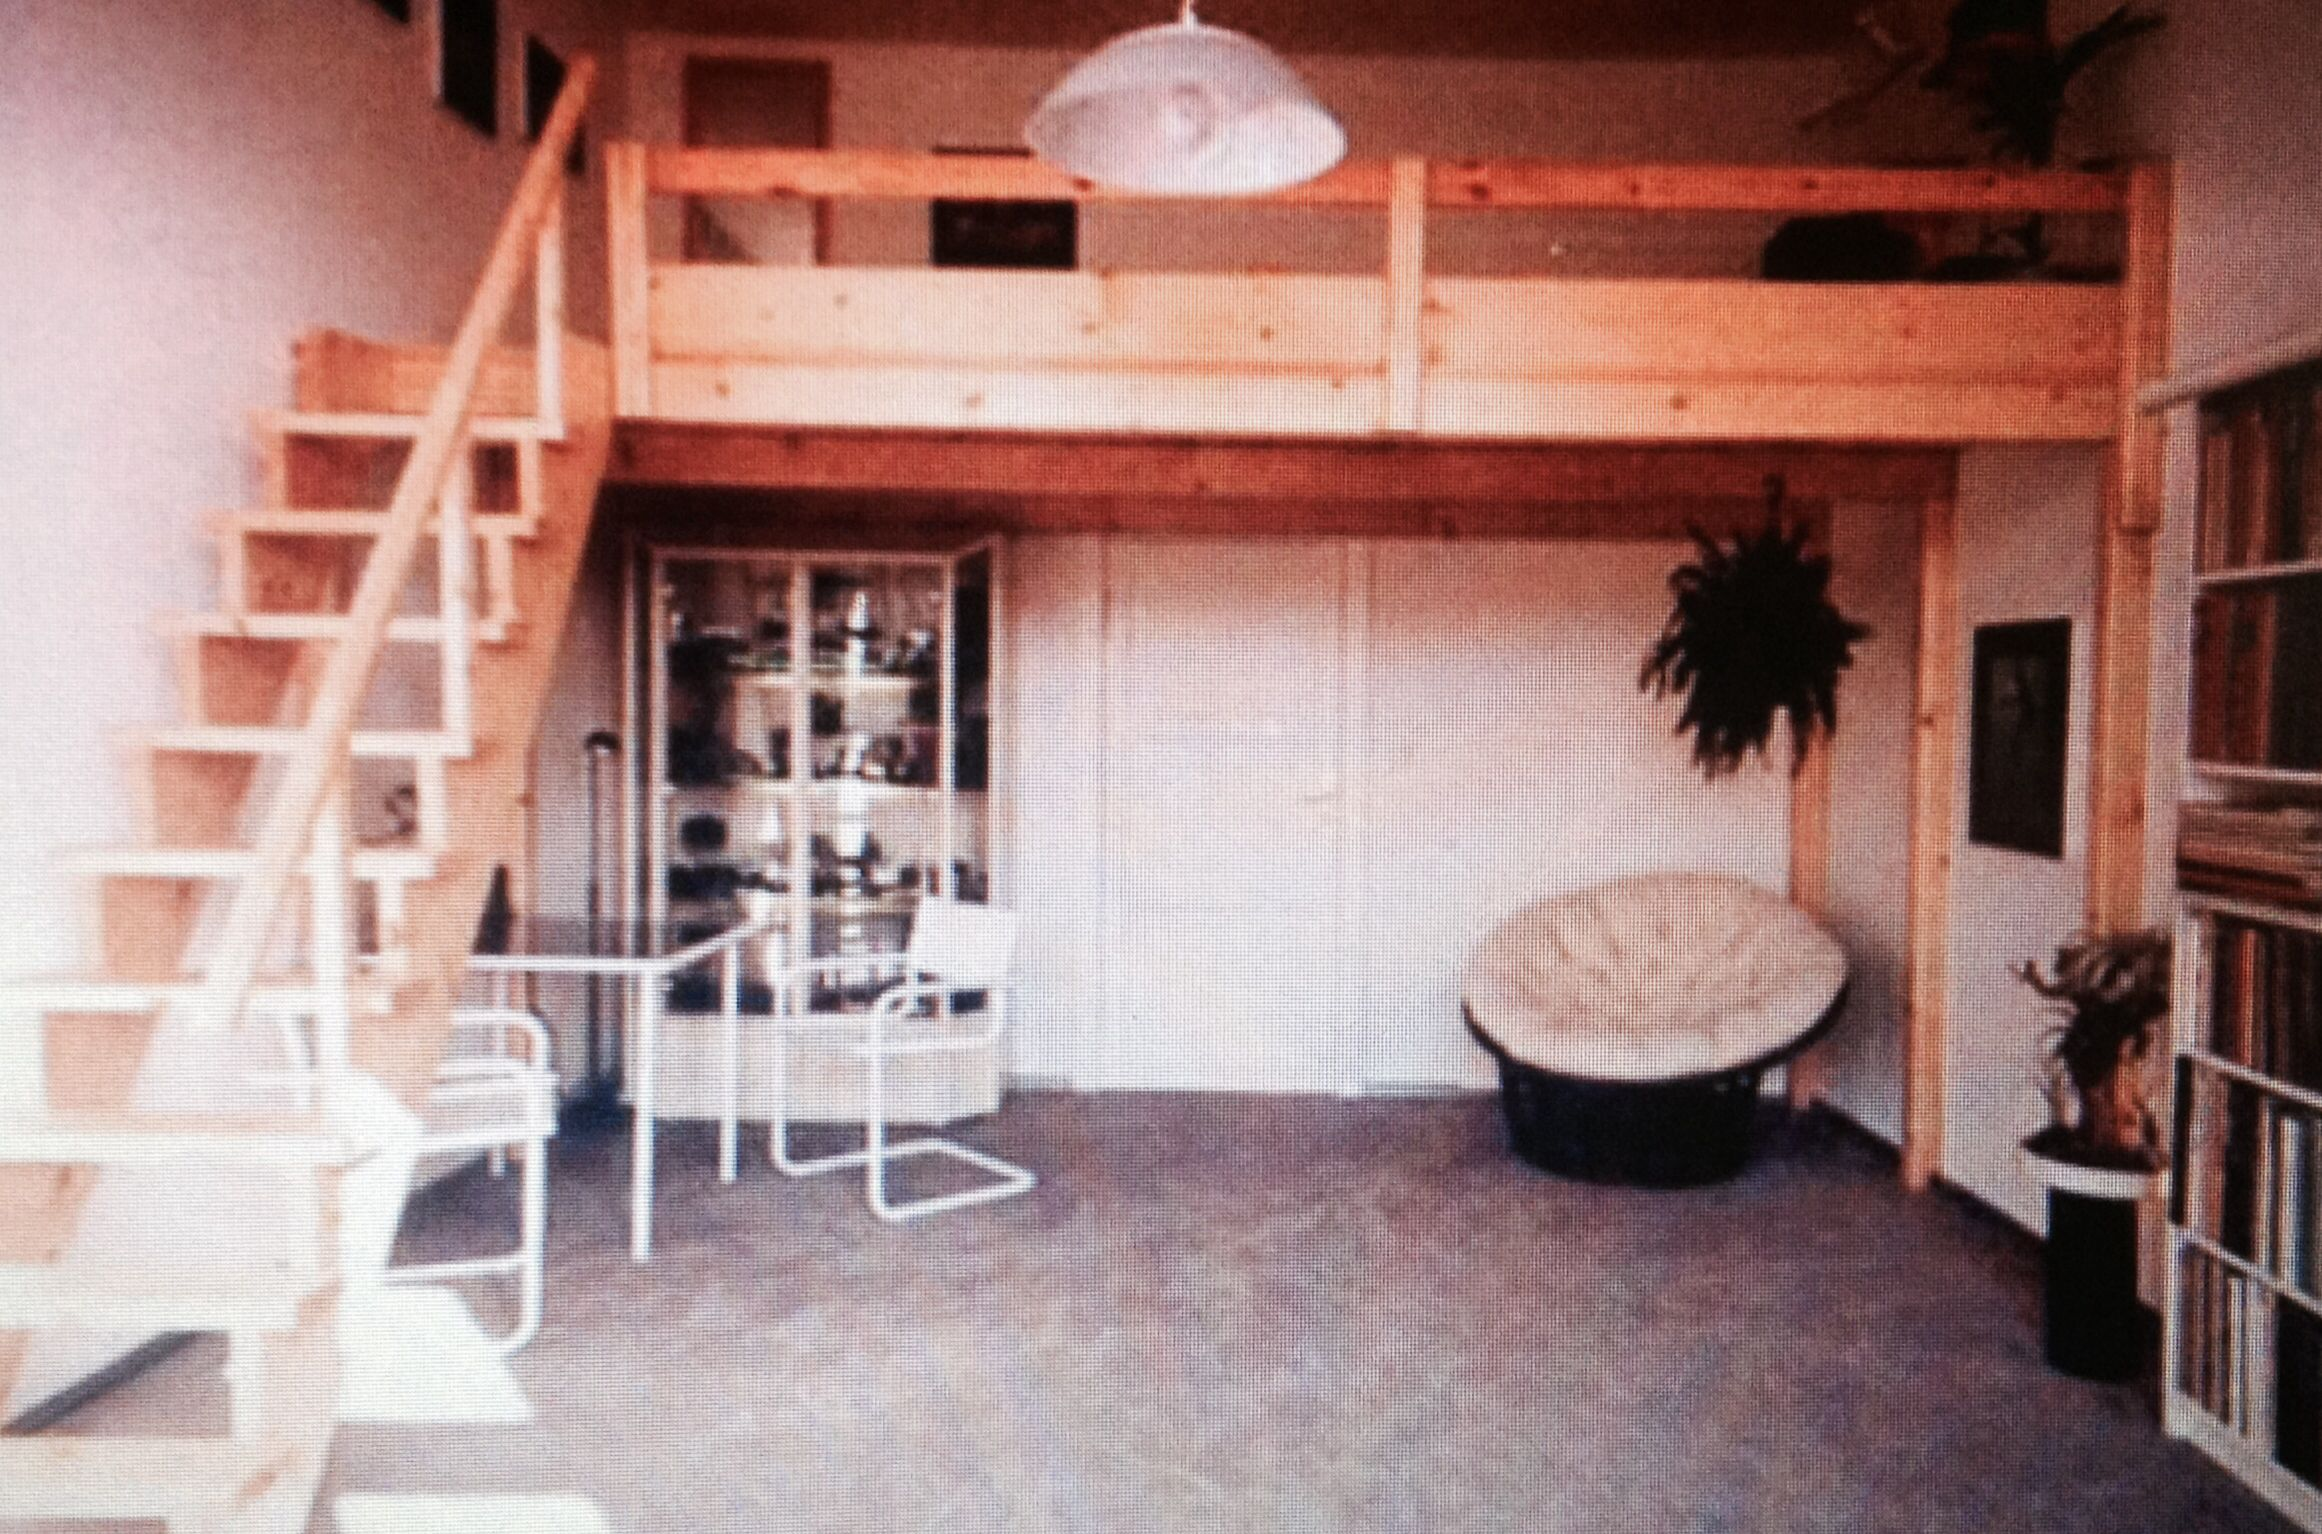 diy hochbett ideen kinderhochbett pinterest lofts loft room and mezzanine. Black Bedroom Furniture Sets. Home Design Ideas